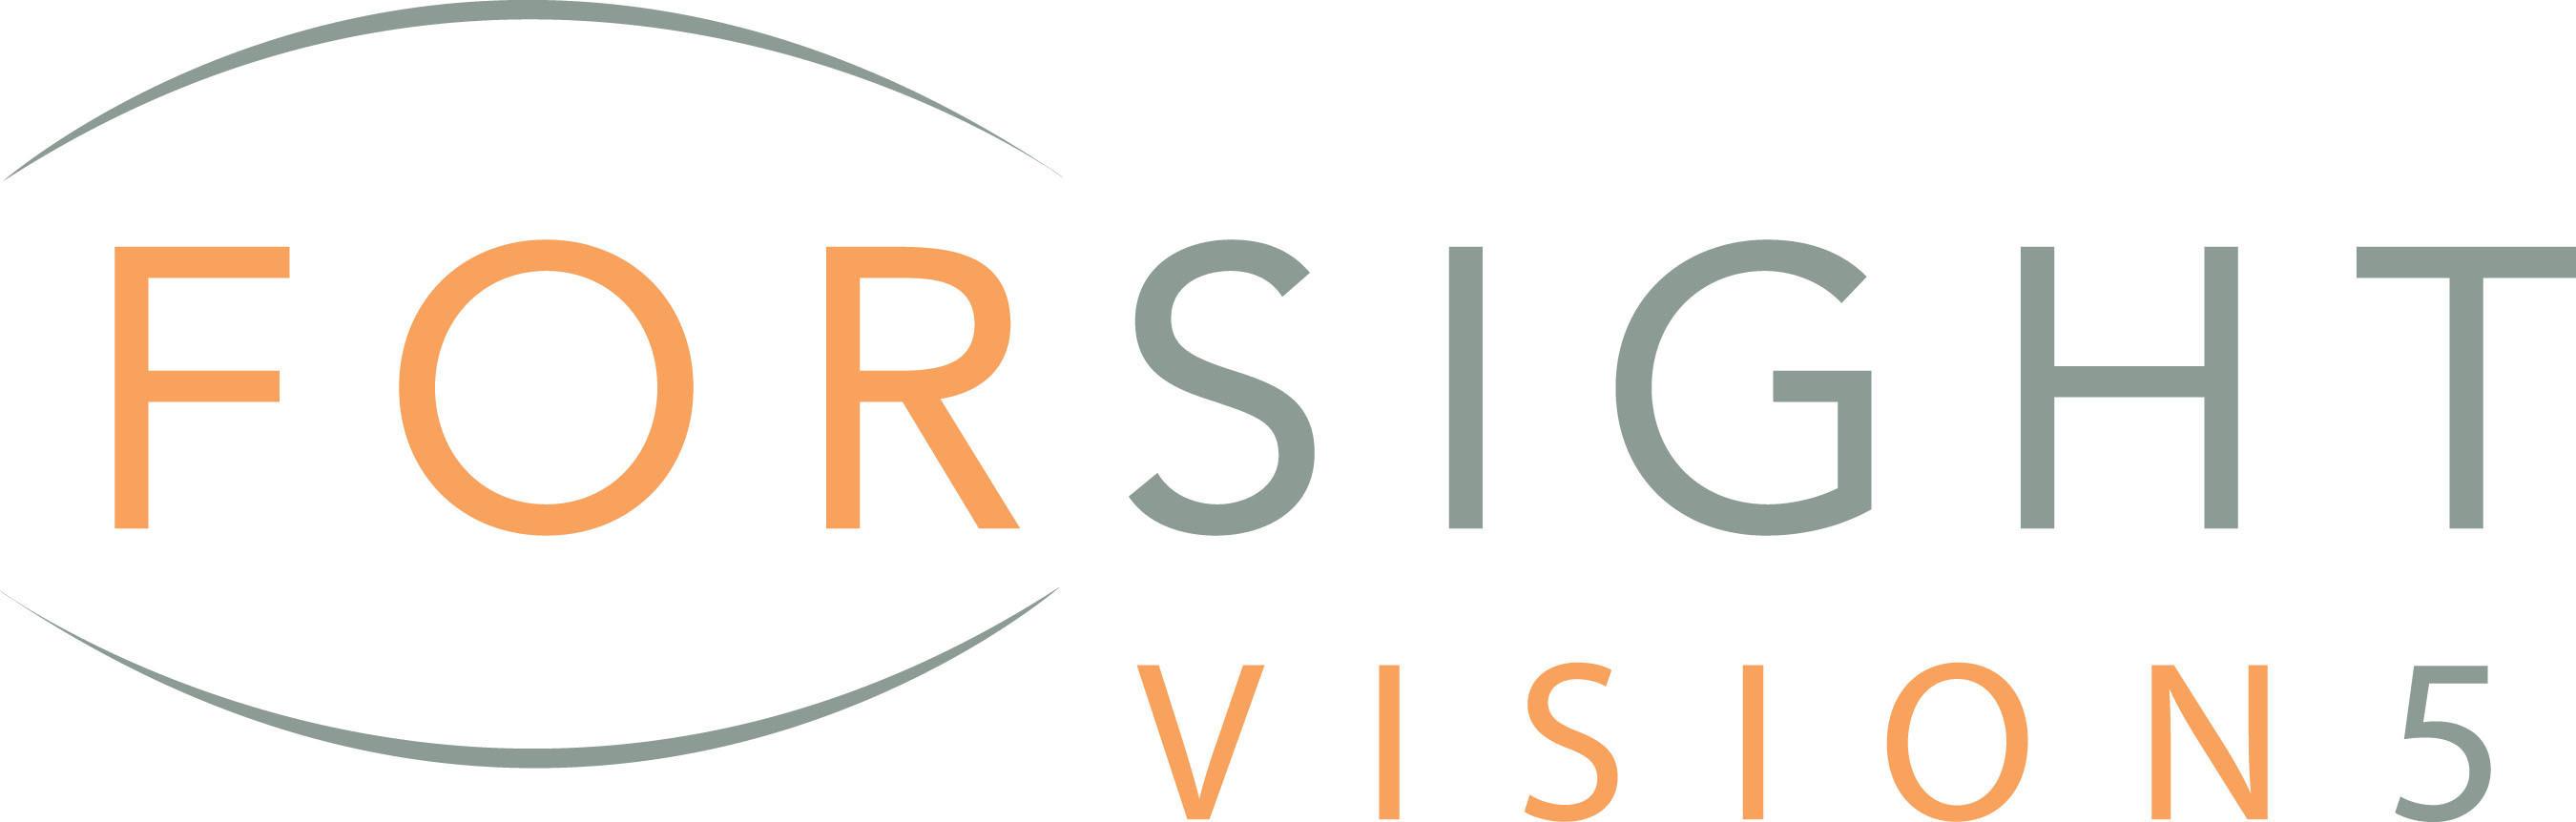 ForSight VISION5 logo (PRNewsFoto/ForSight VISION5) (PRNewsFoto/ForSight VISION5)